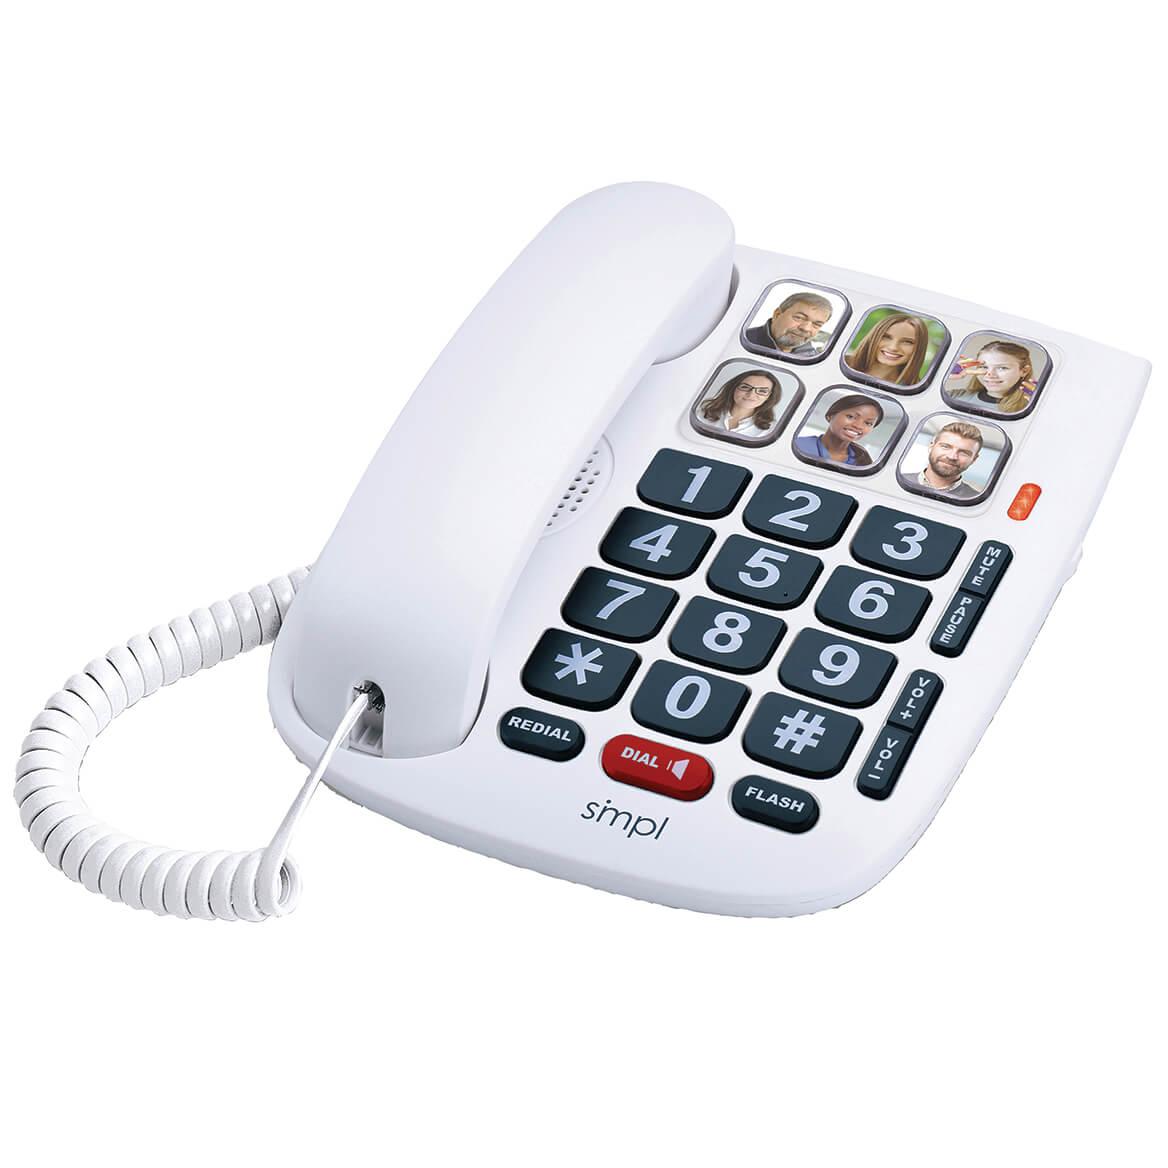 Simpl™ Photo Phone-371131